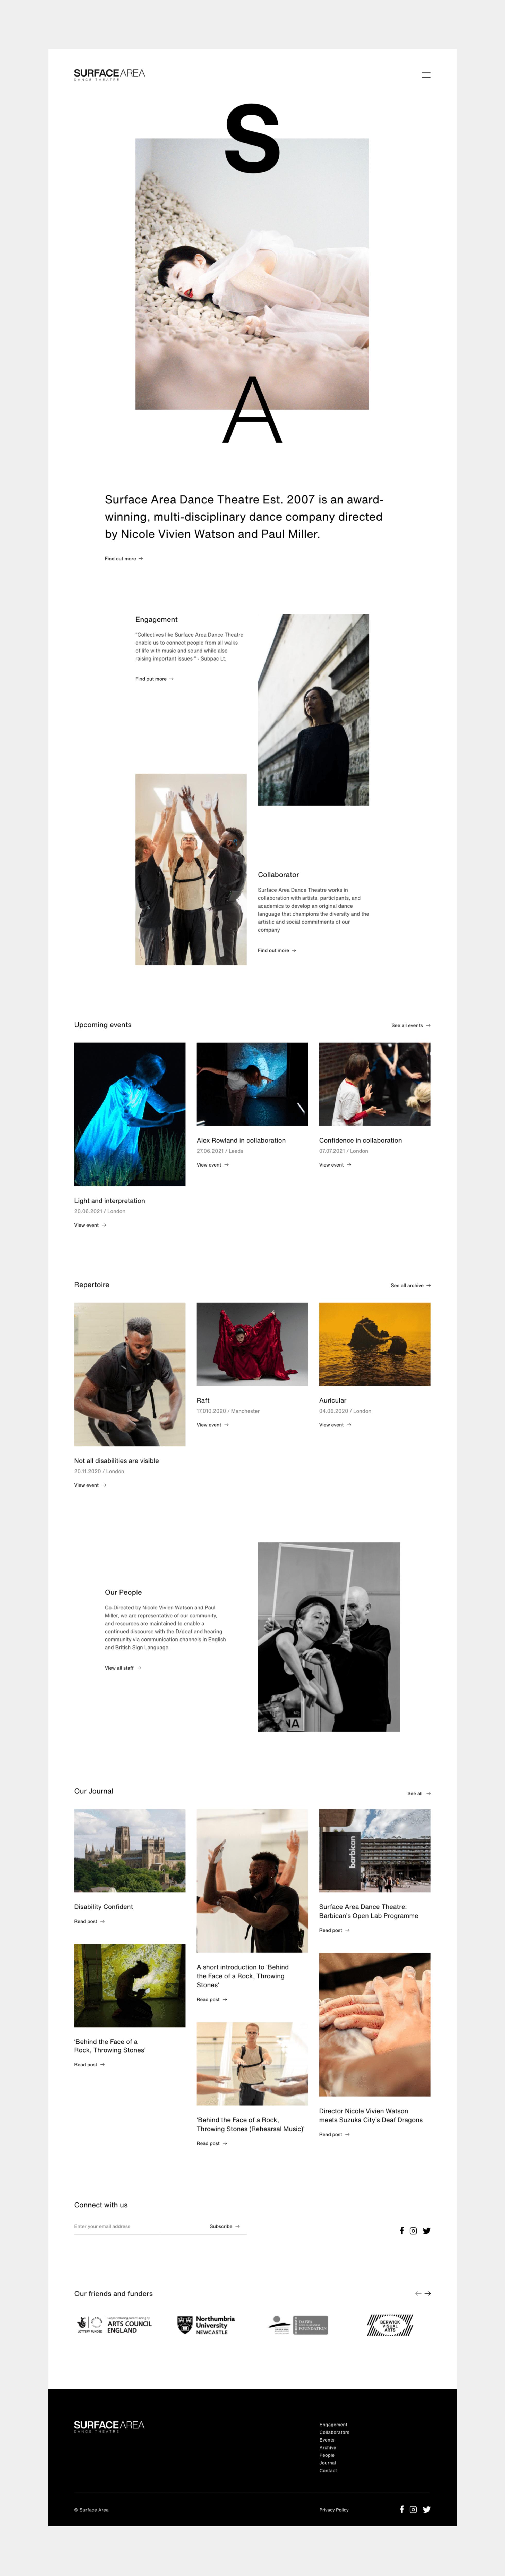 Surface Area website design by TAC